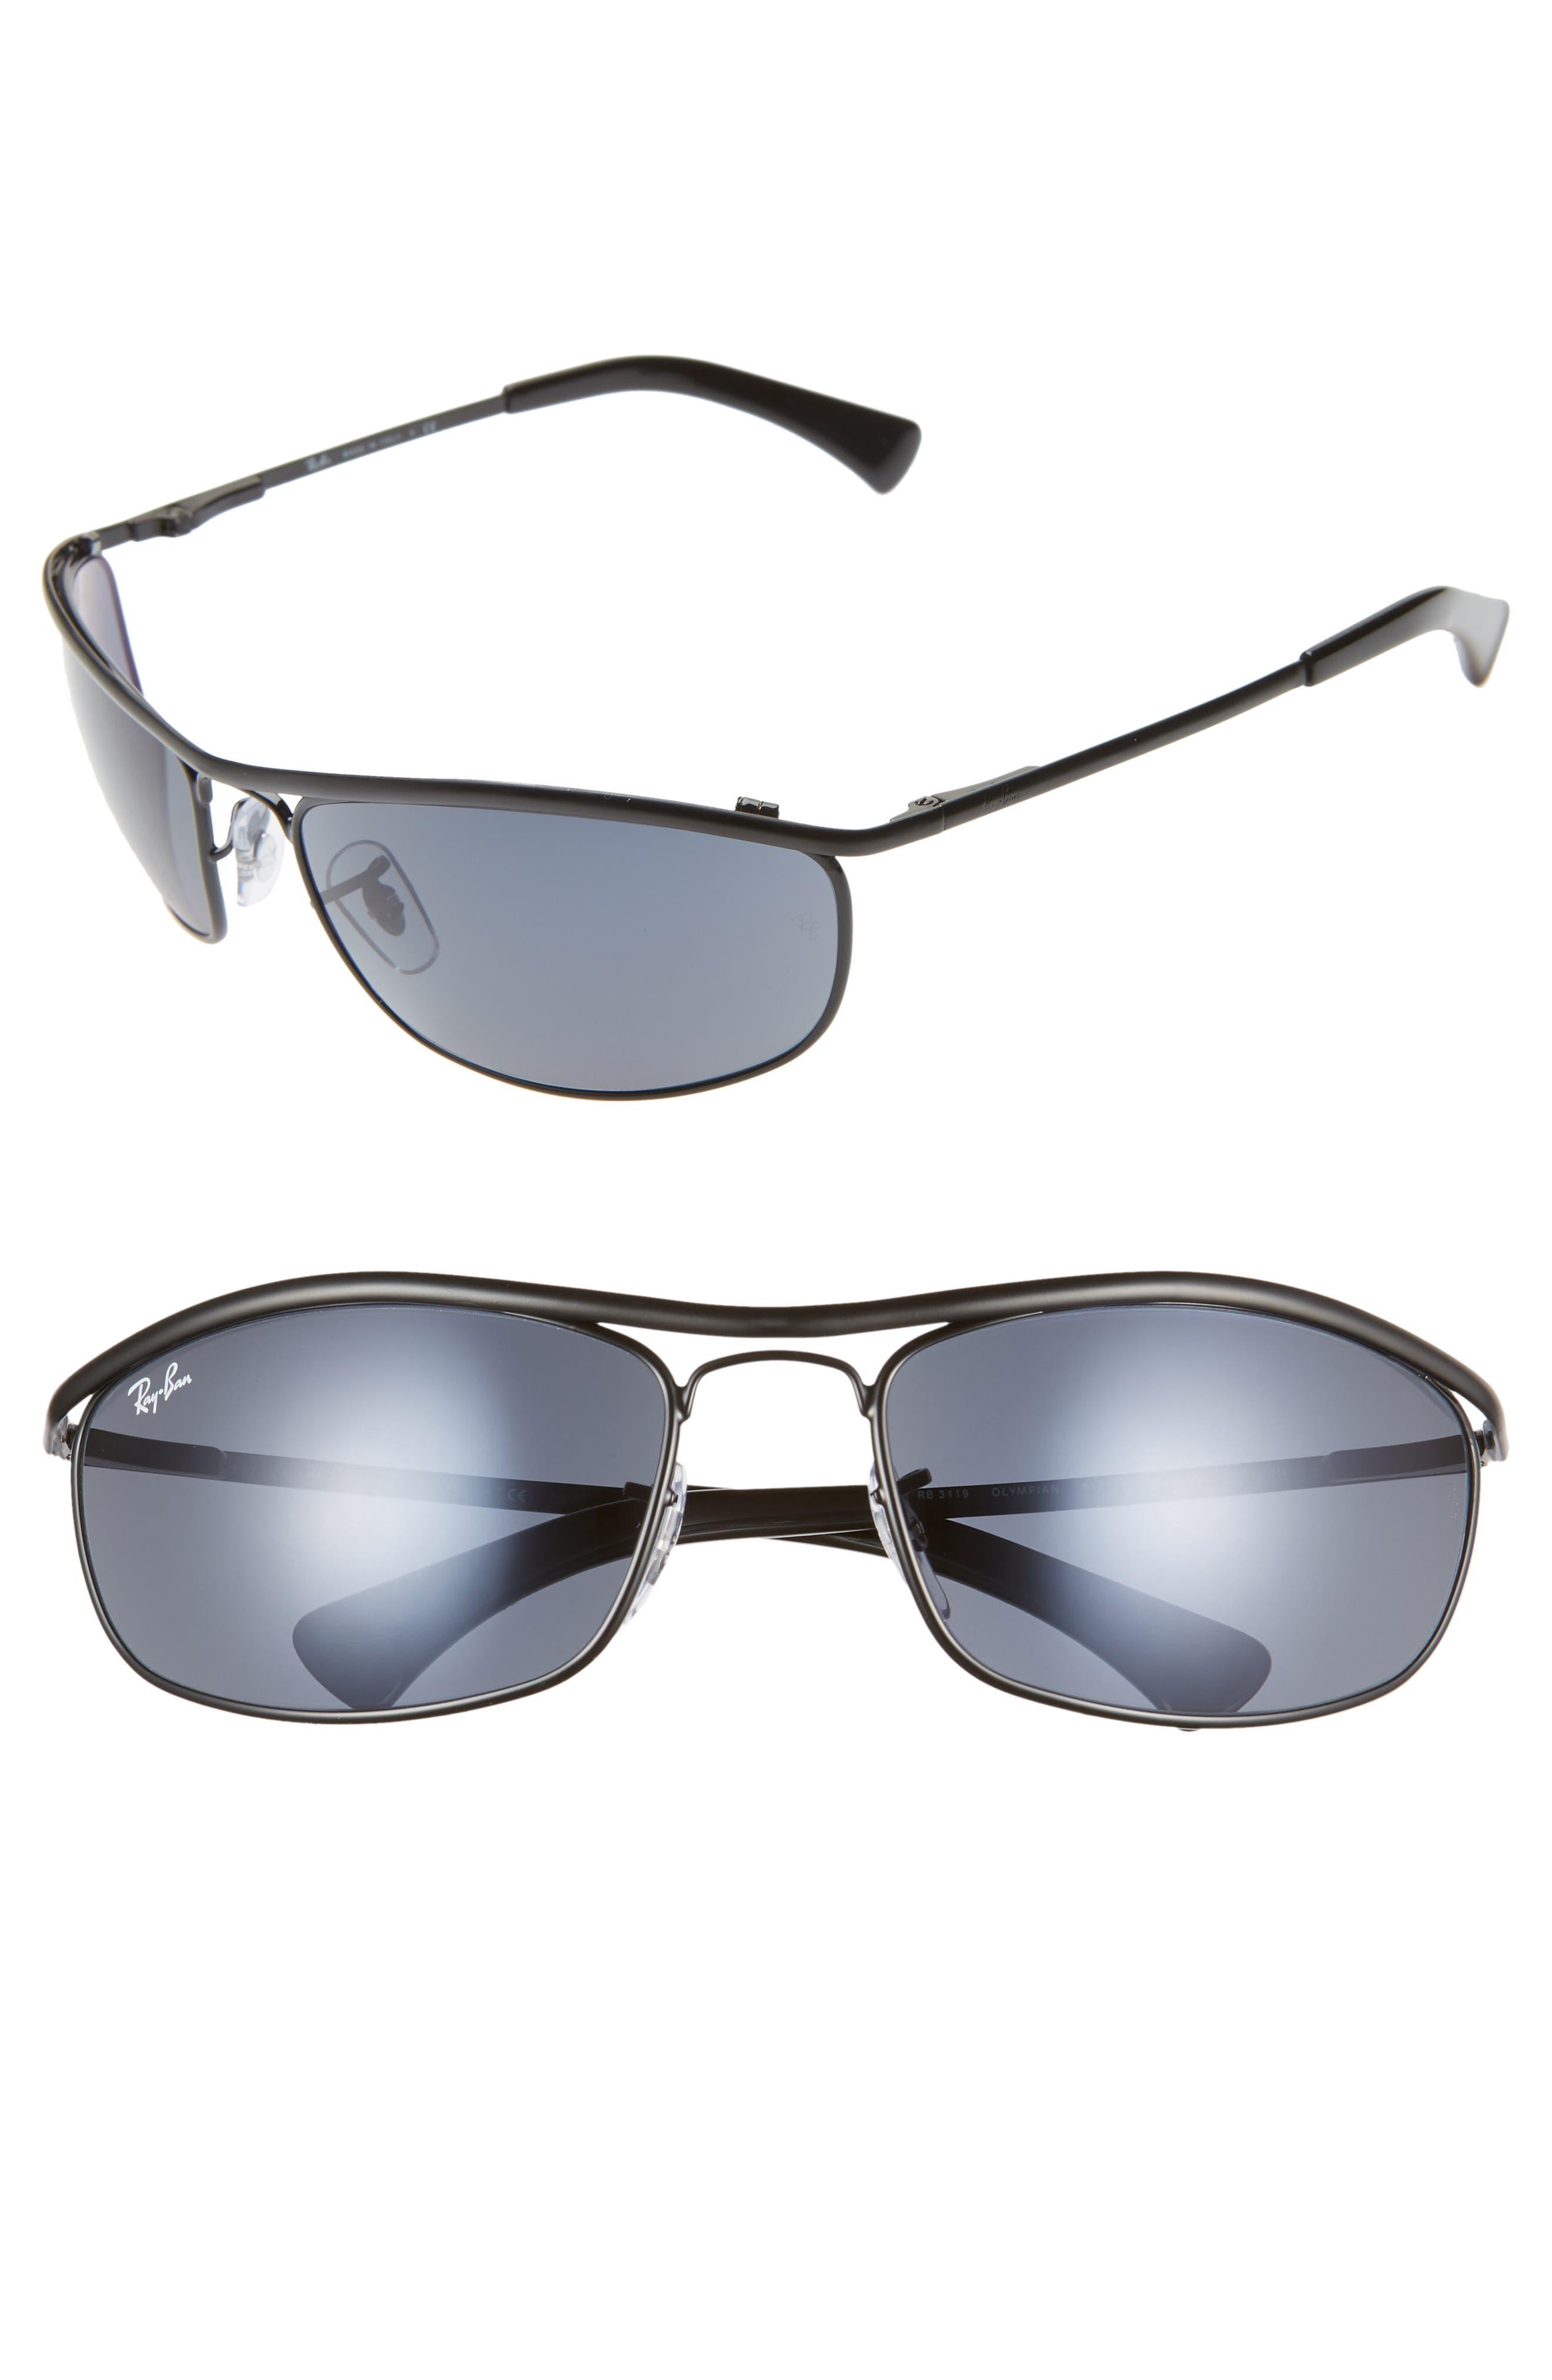 Ray-Ban 62Mm Aviator Shield Sunglasses - Black/ Blue Solid